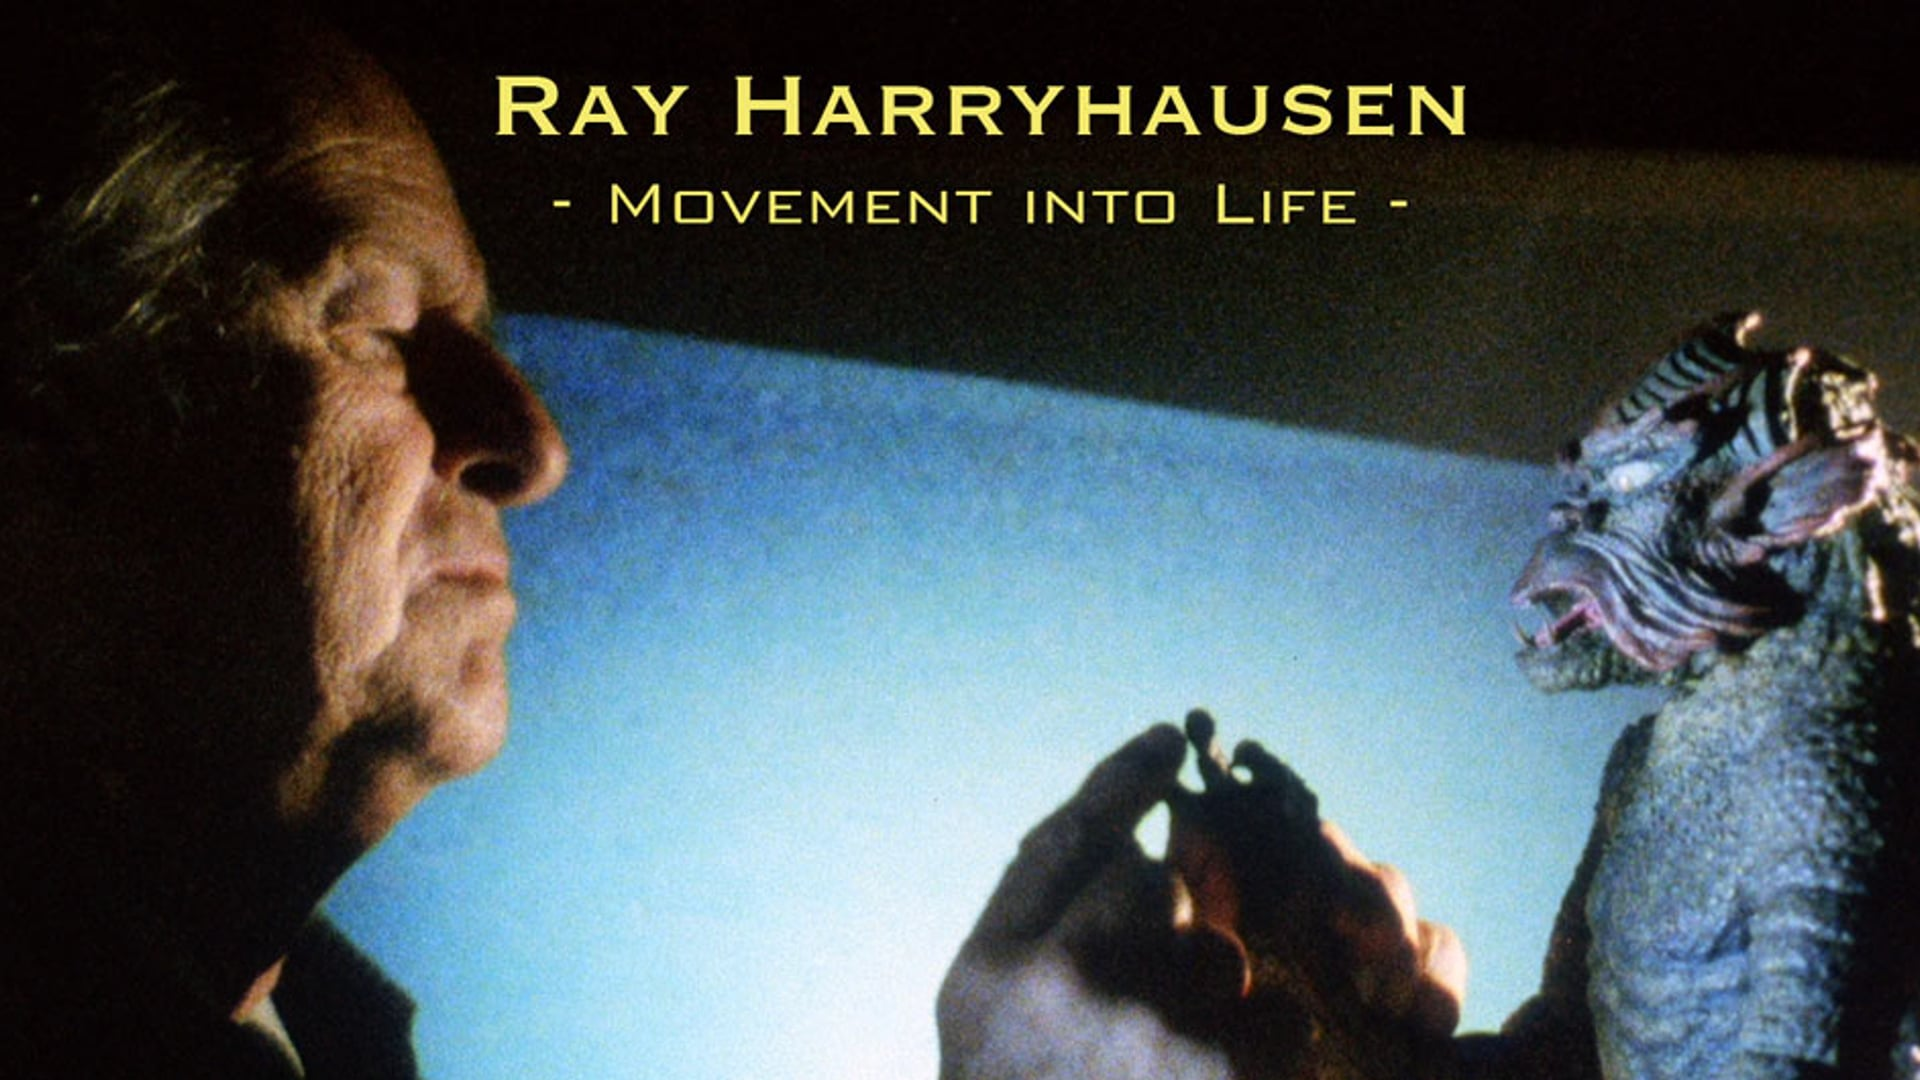 Ray Harryhausen - Movement into Life